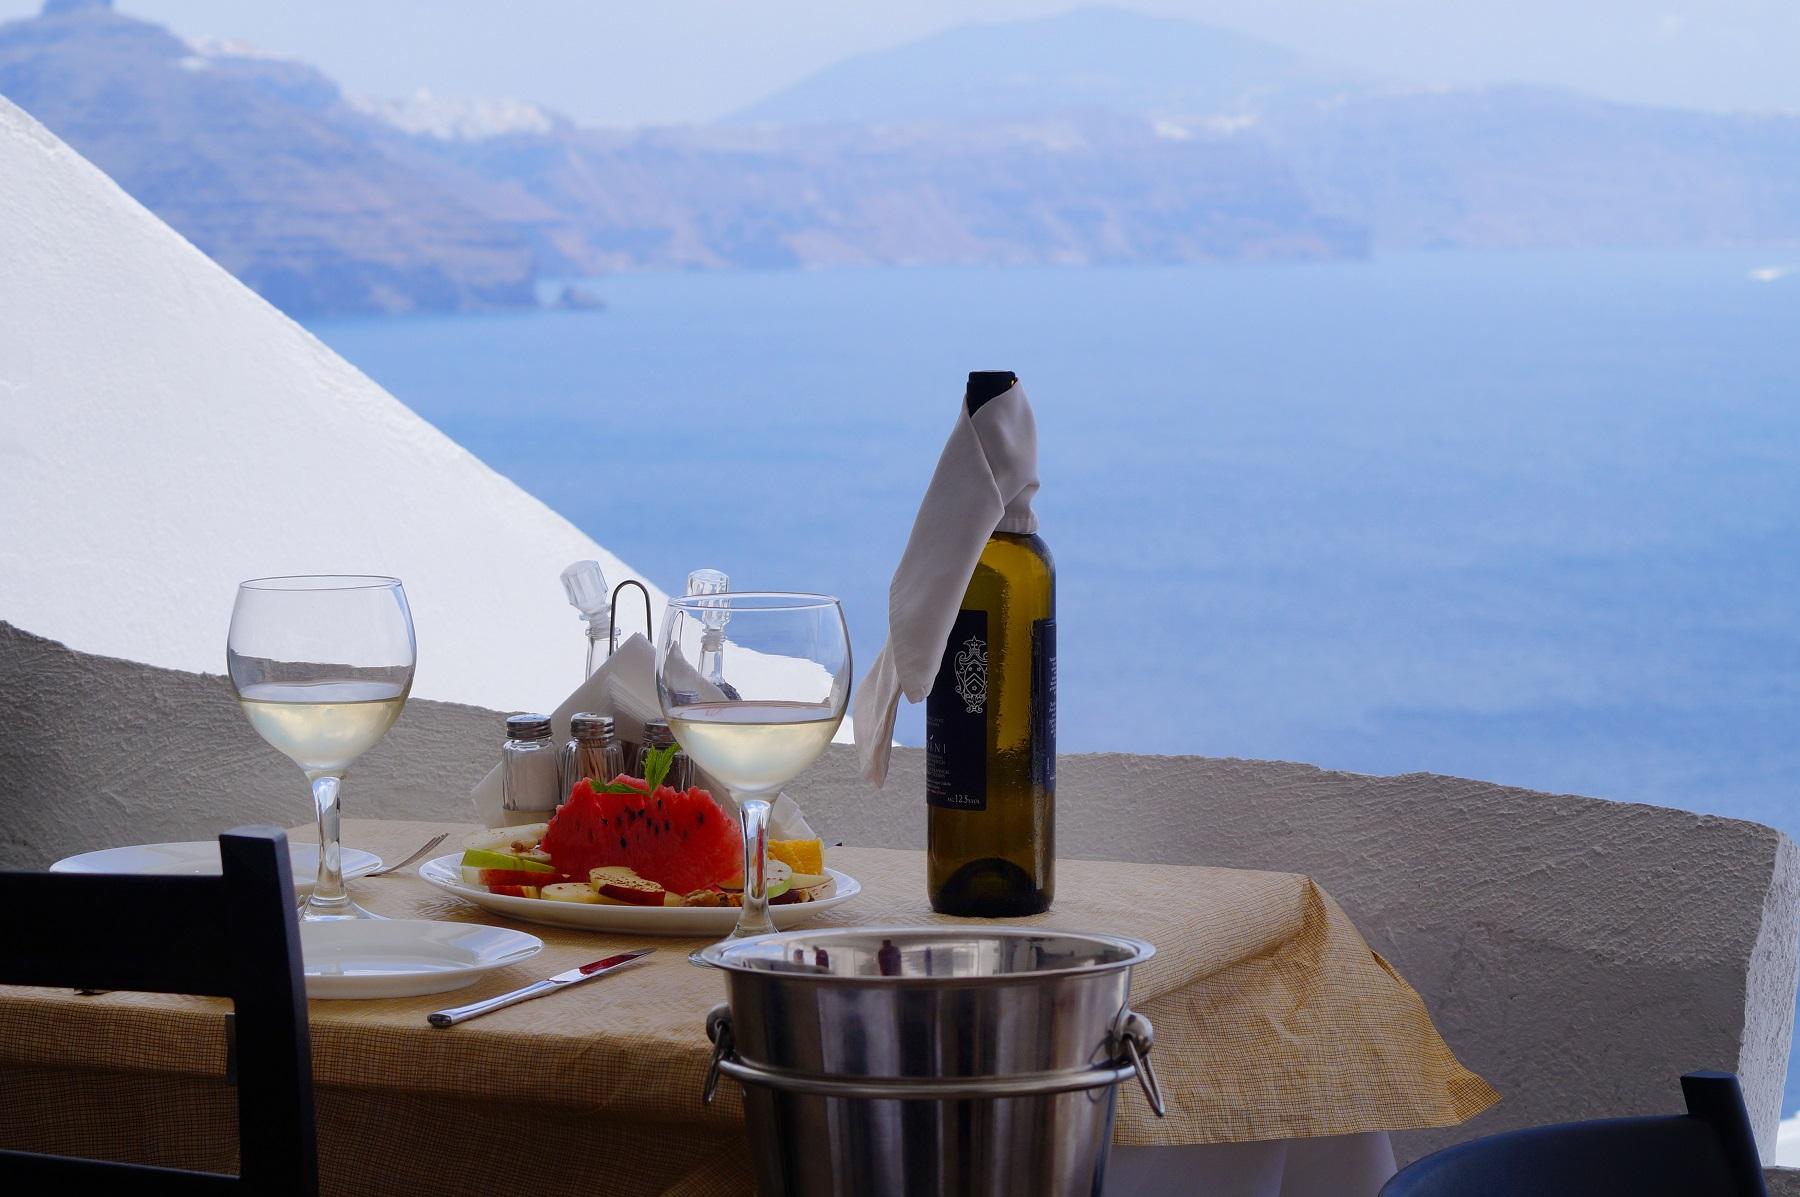 apsithia-oia-santorini-wines-restaurants